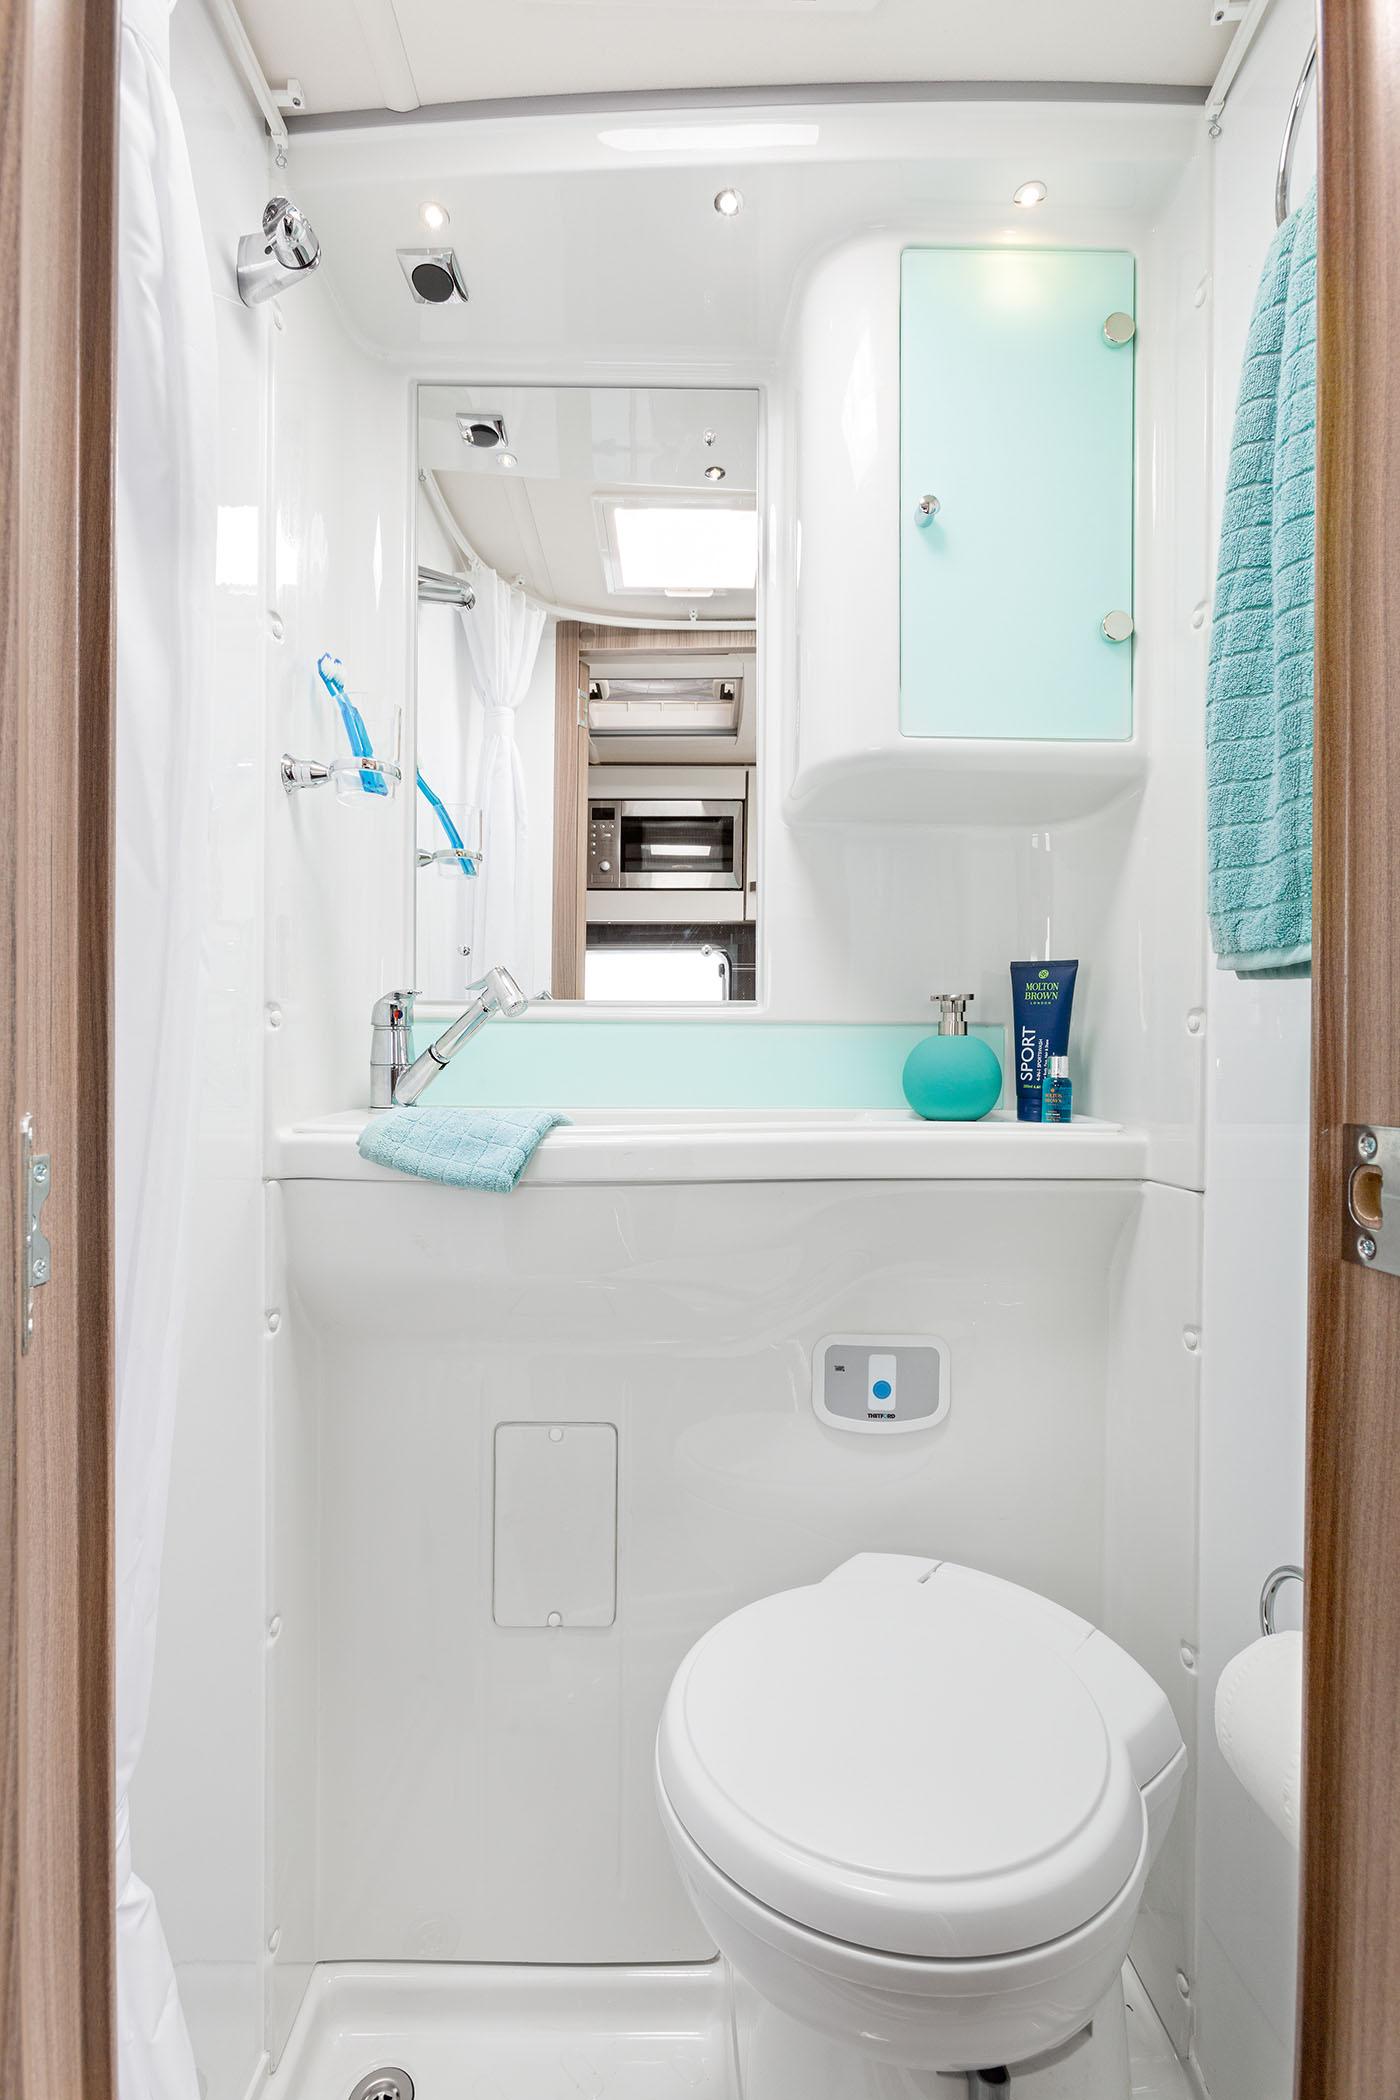 [INT]-Rio-325-Washroom-[SWIFT]